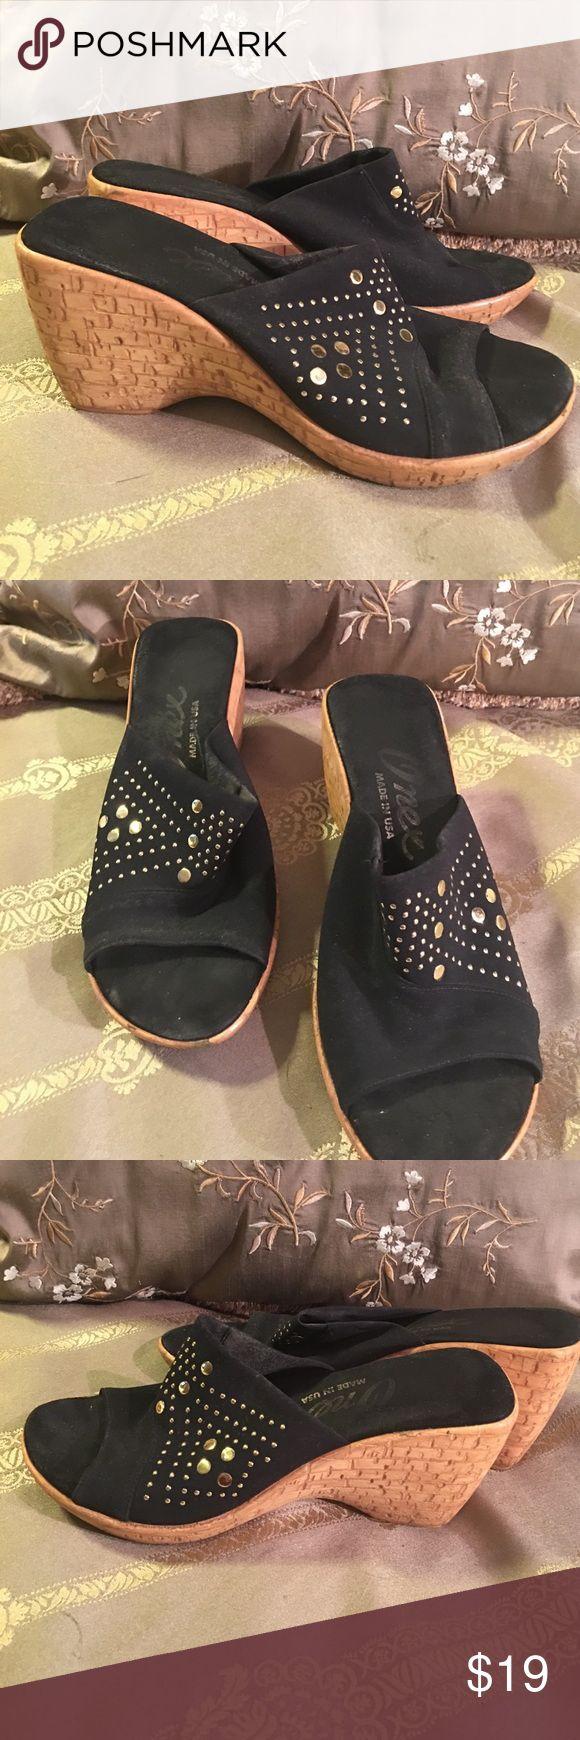 Onex black slip on sandals 6M Onex slip on sandals onex Shoes Sandals